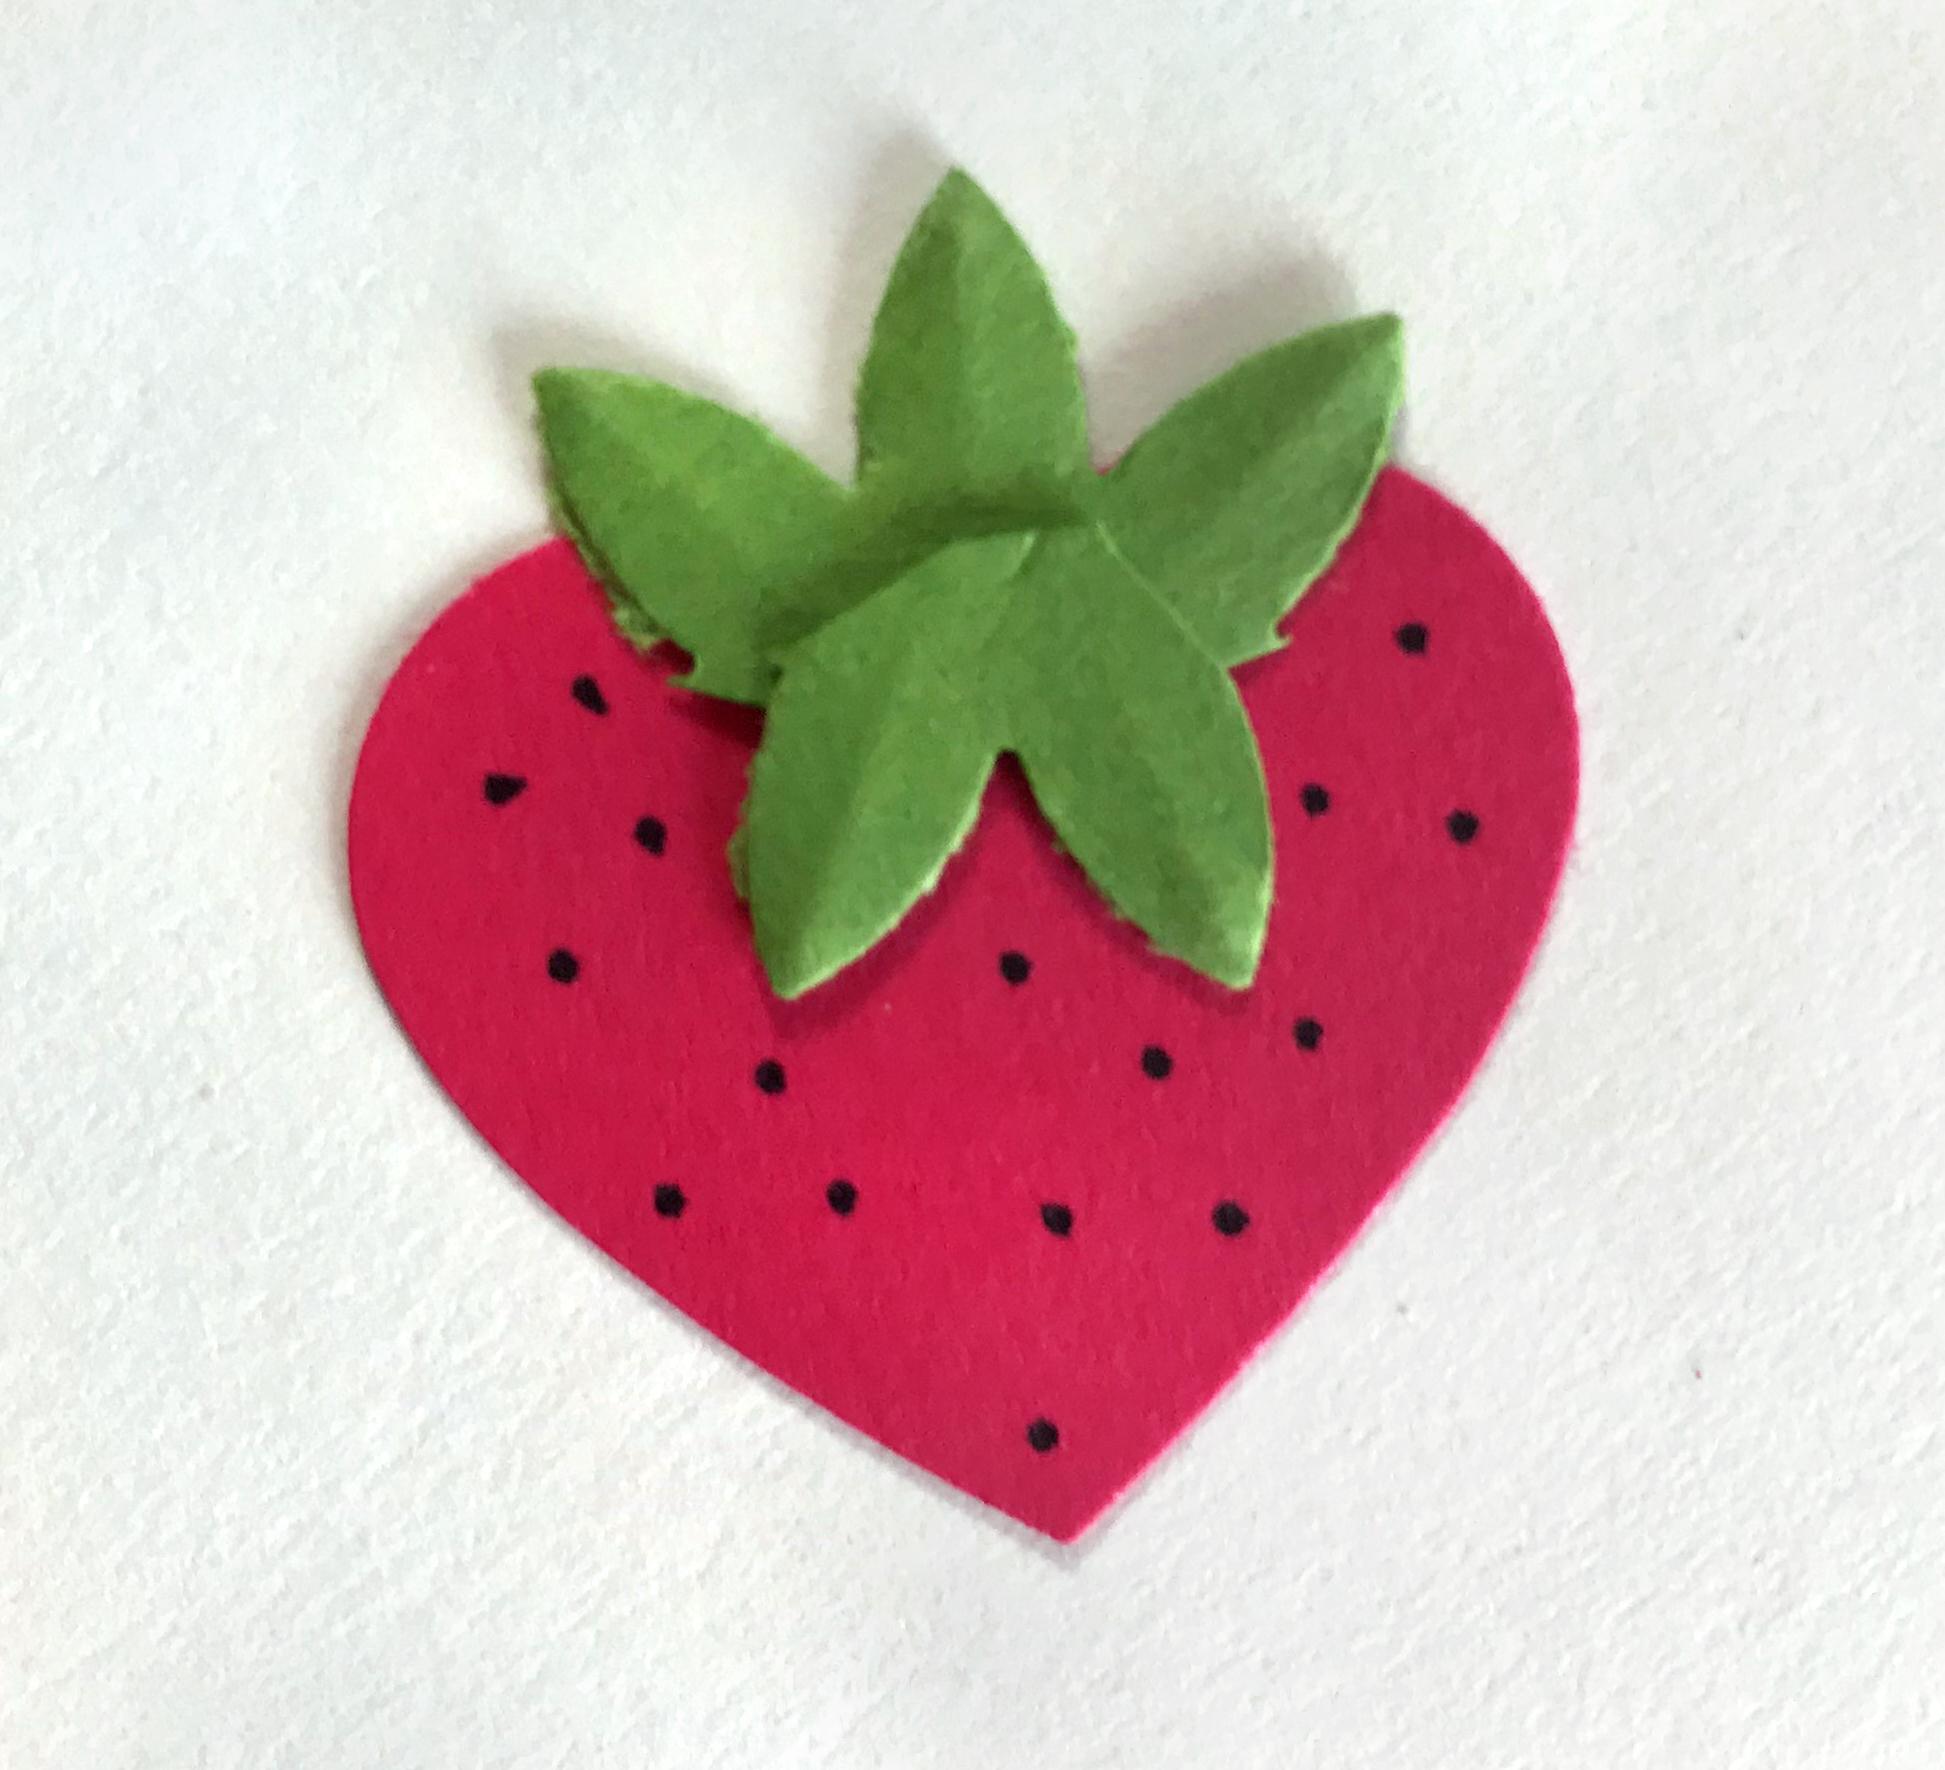 Locally-Grown-Strawberry-Scrapbook-Layout-Process6-Creative-Memories